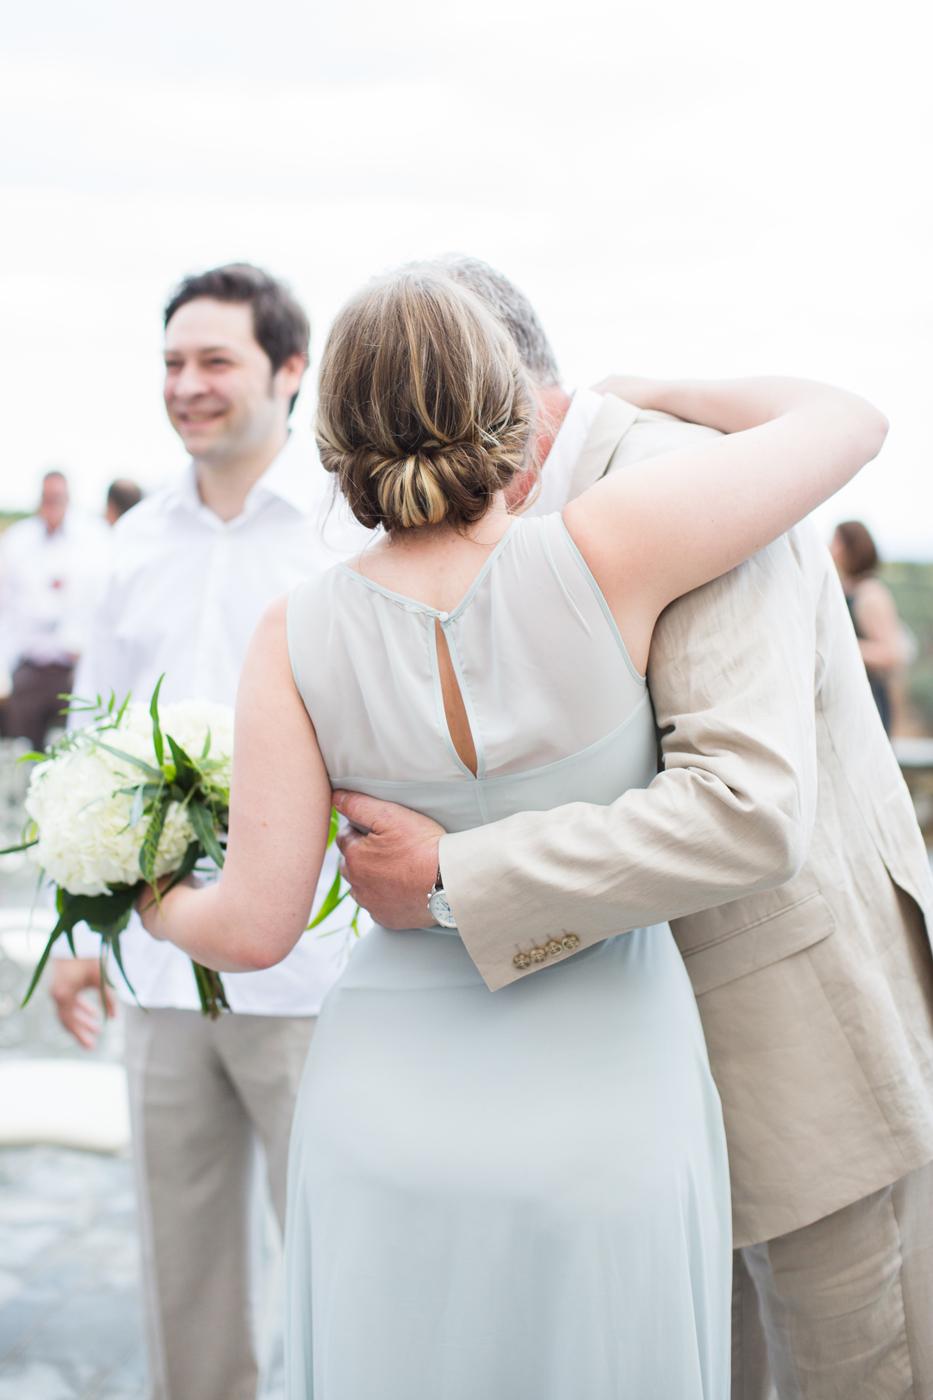 Intimate Outdoor Destination Wedding at Kinsterna Hotel & Spa in Greece